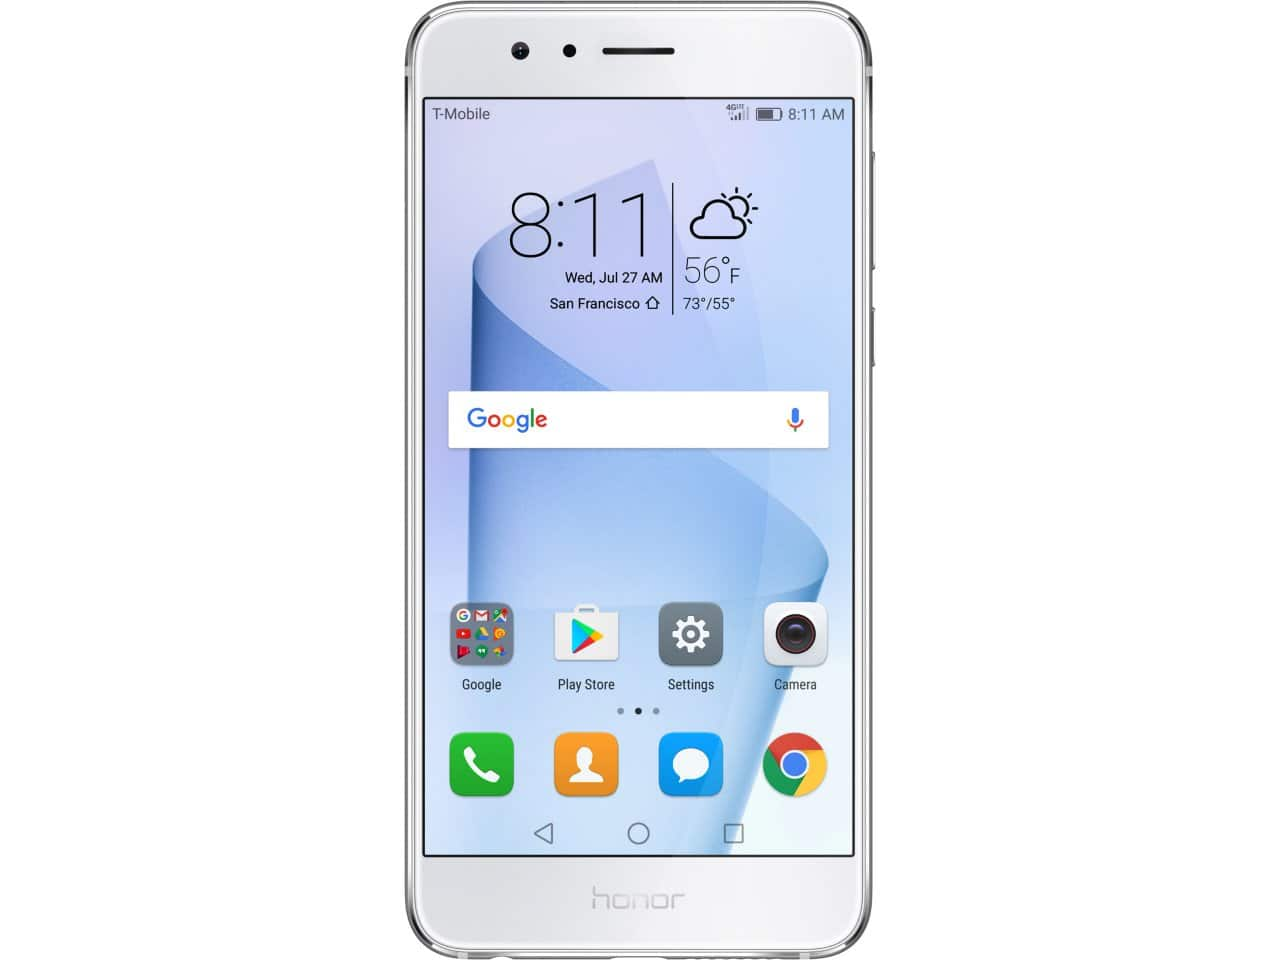 32GB Huawei Honor 8 Unlocked Smartphone Pre-Order + $50 GC + JBL Coach Headphones  $400 & More + Free Shipping